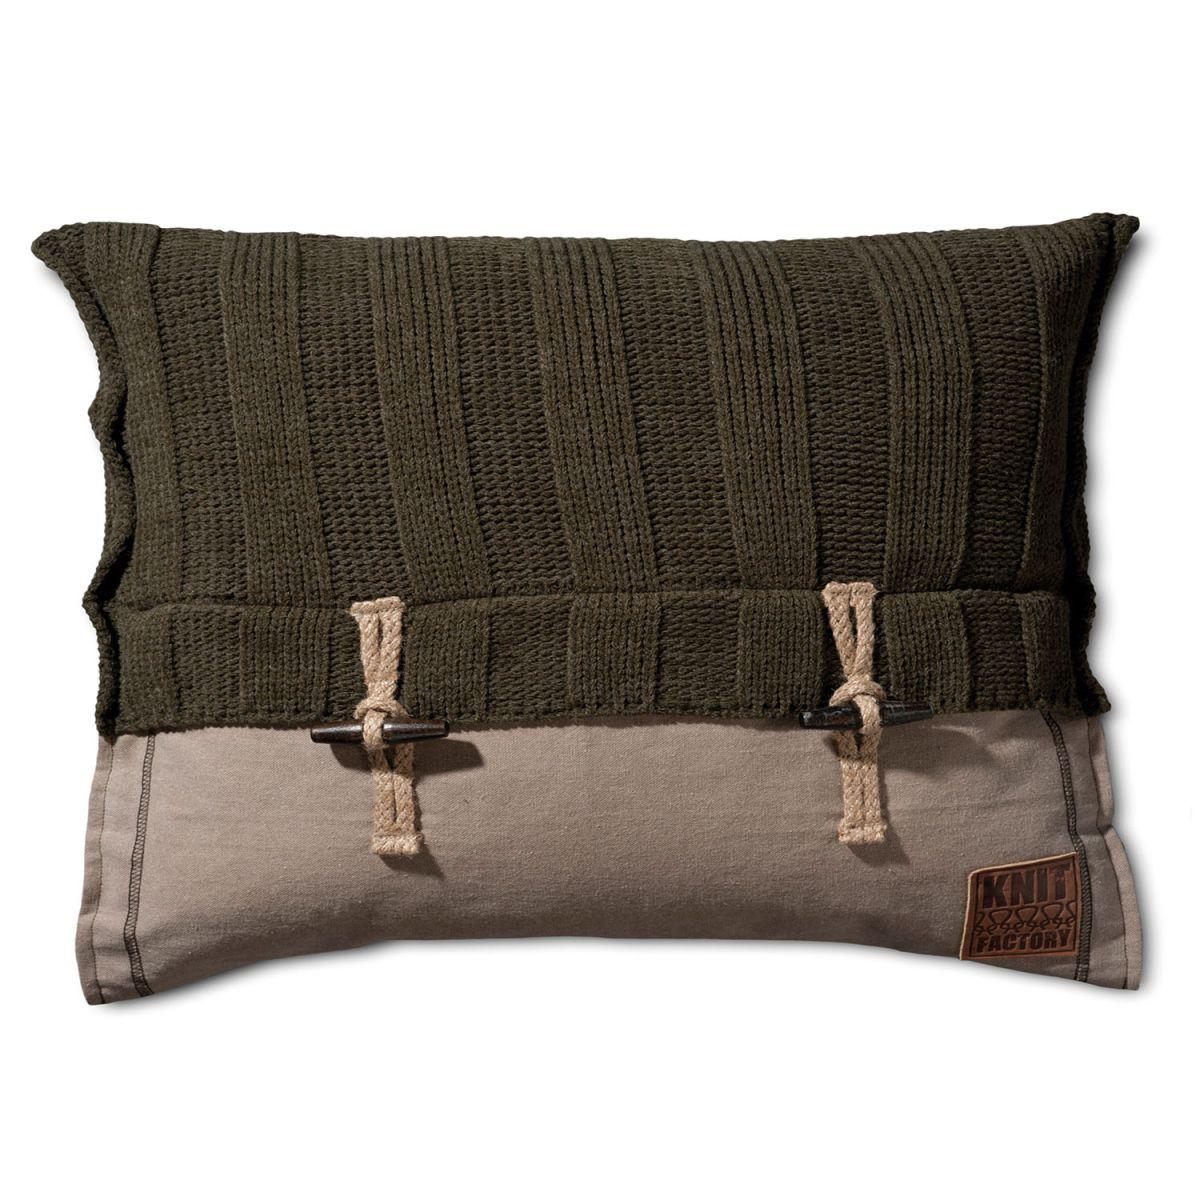 6x6 rib cushion green 60x40